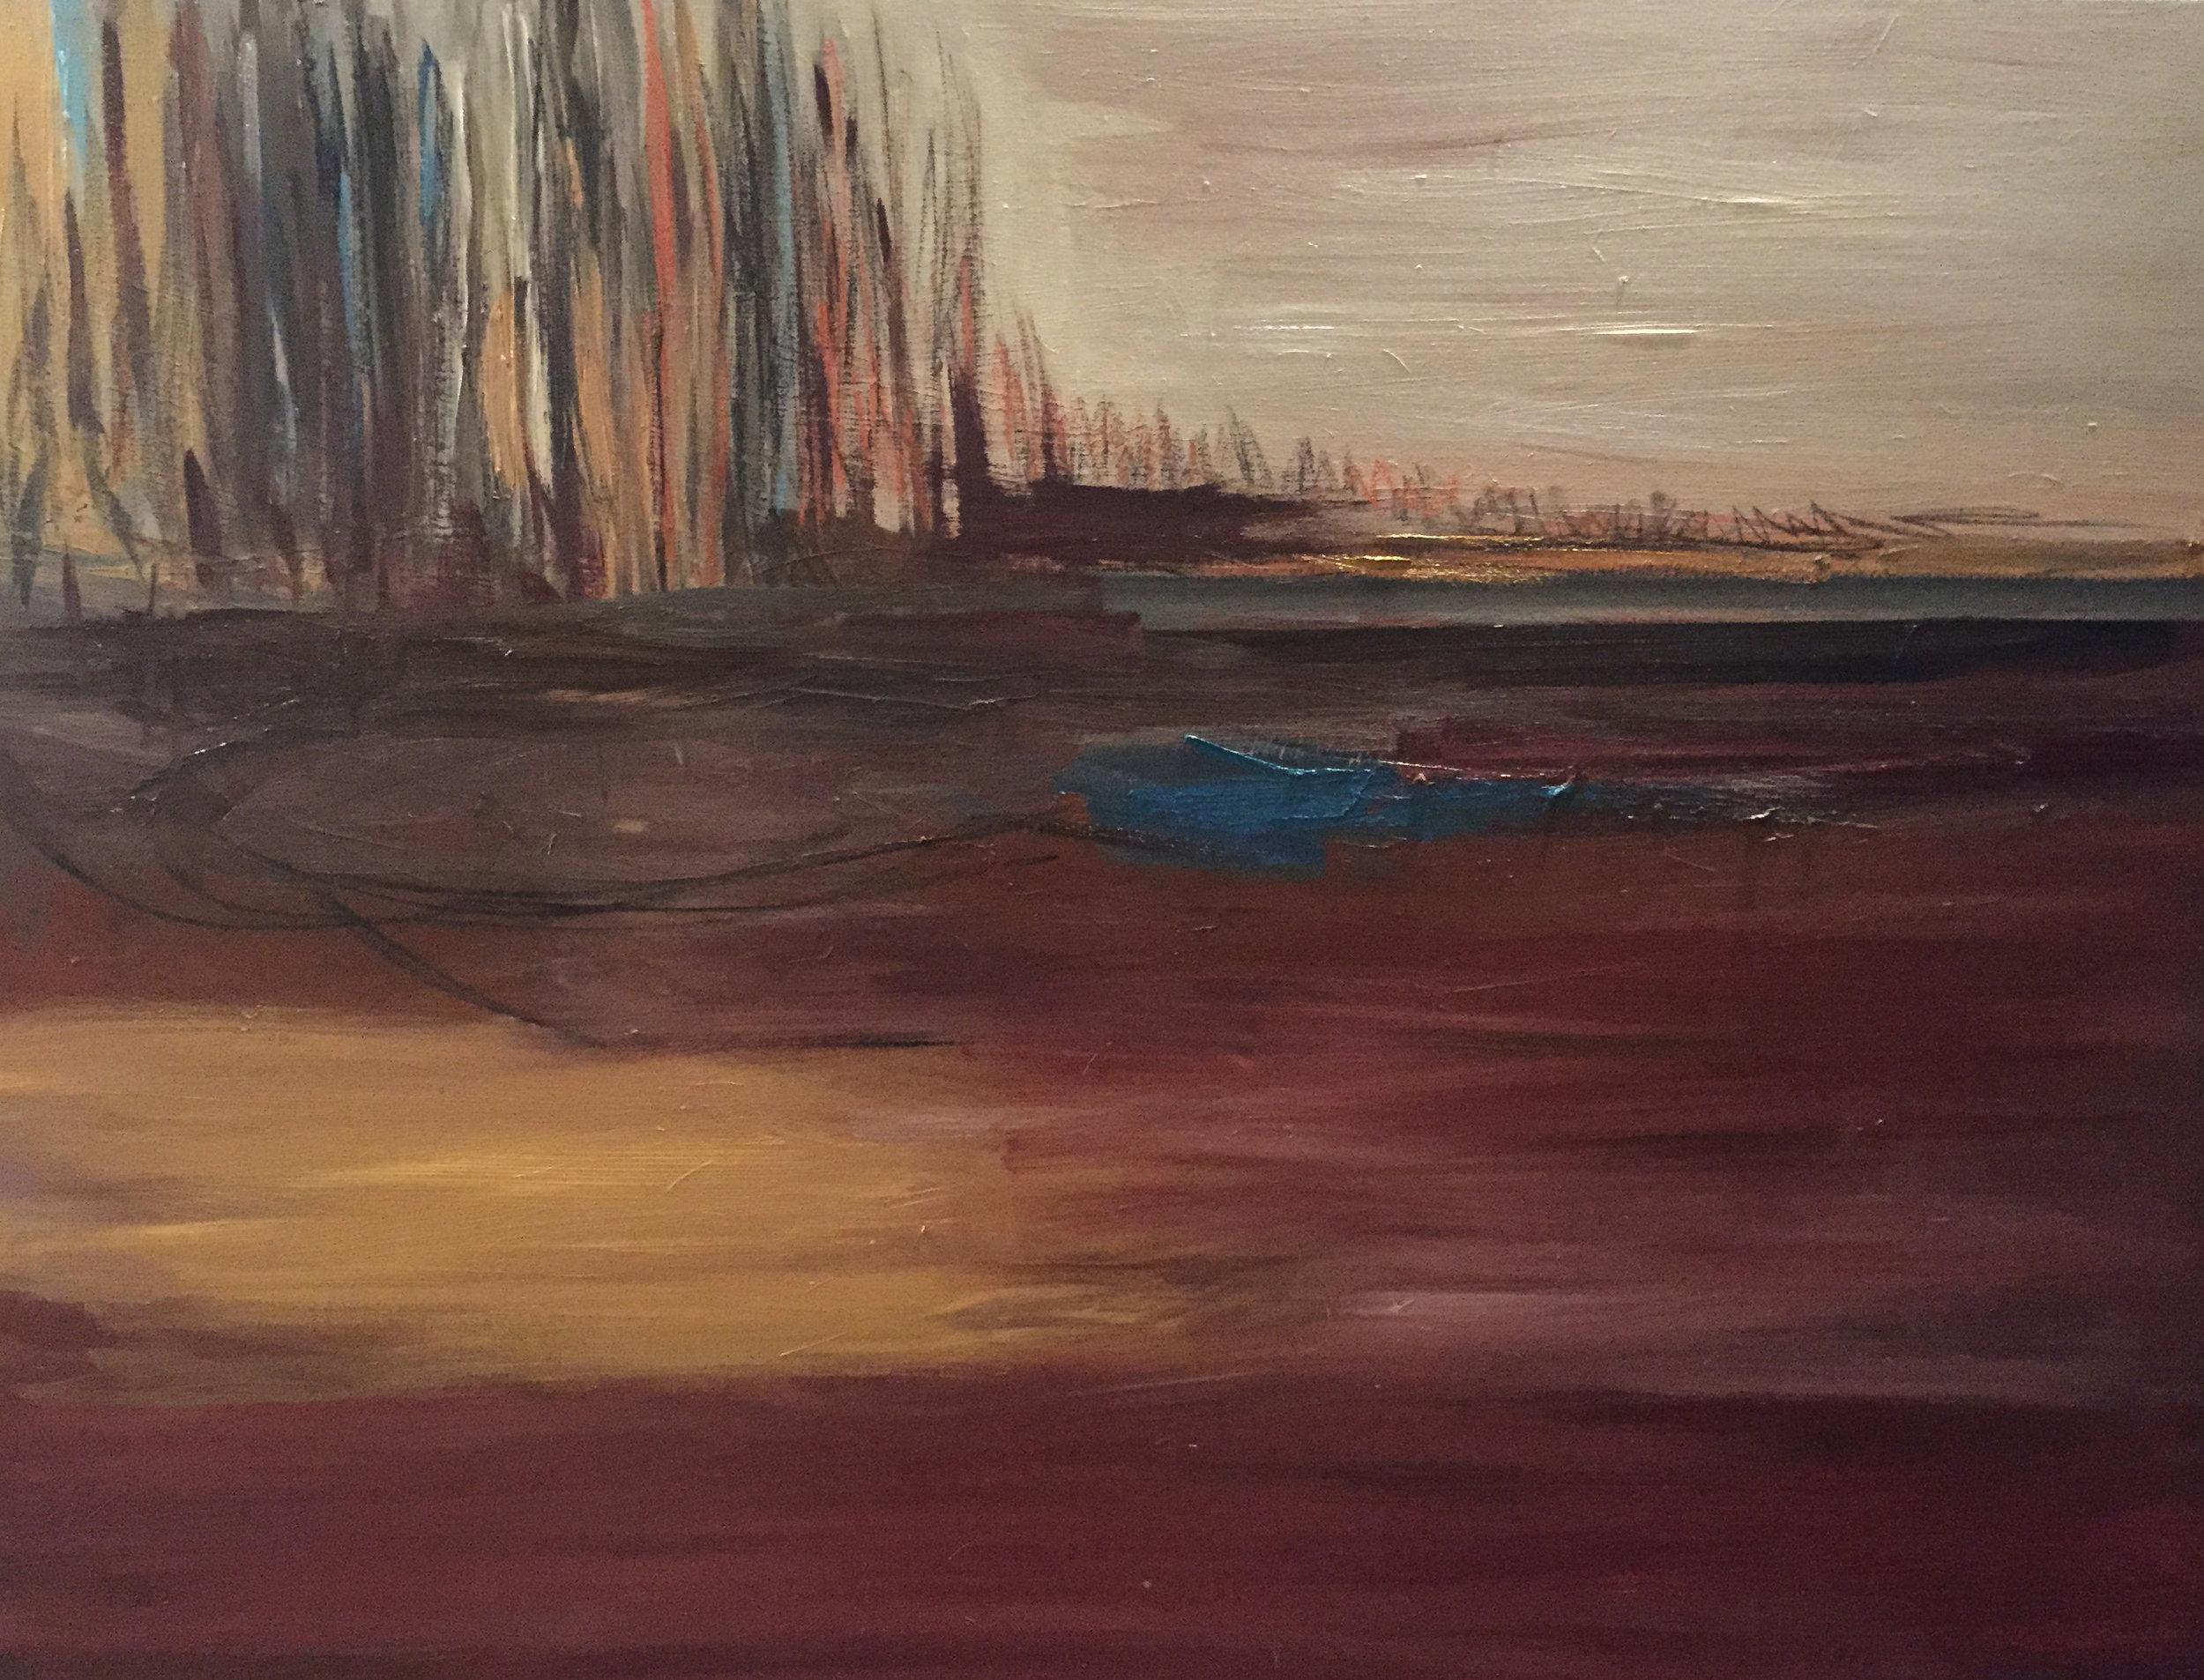 Painting_20_Elizabeth Diaz_Woods Edge II_36x48inches.jpg